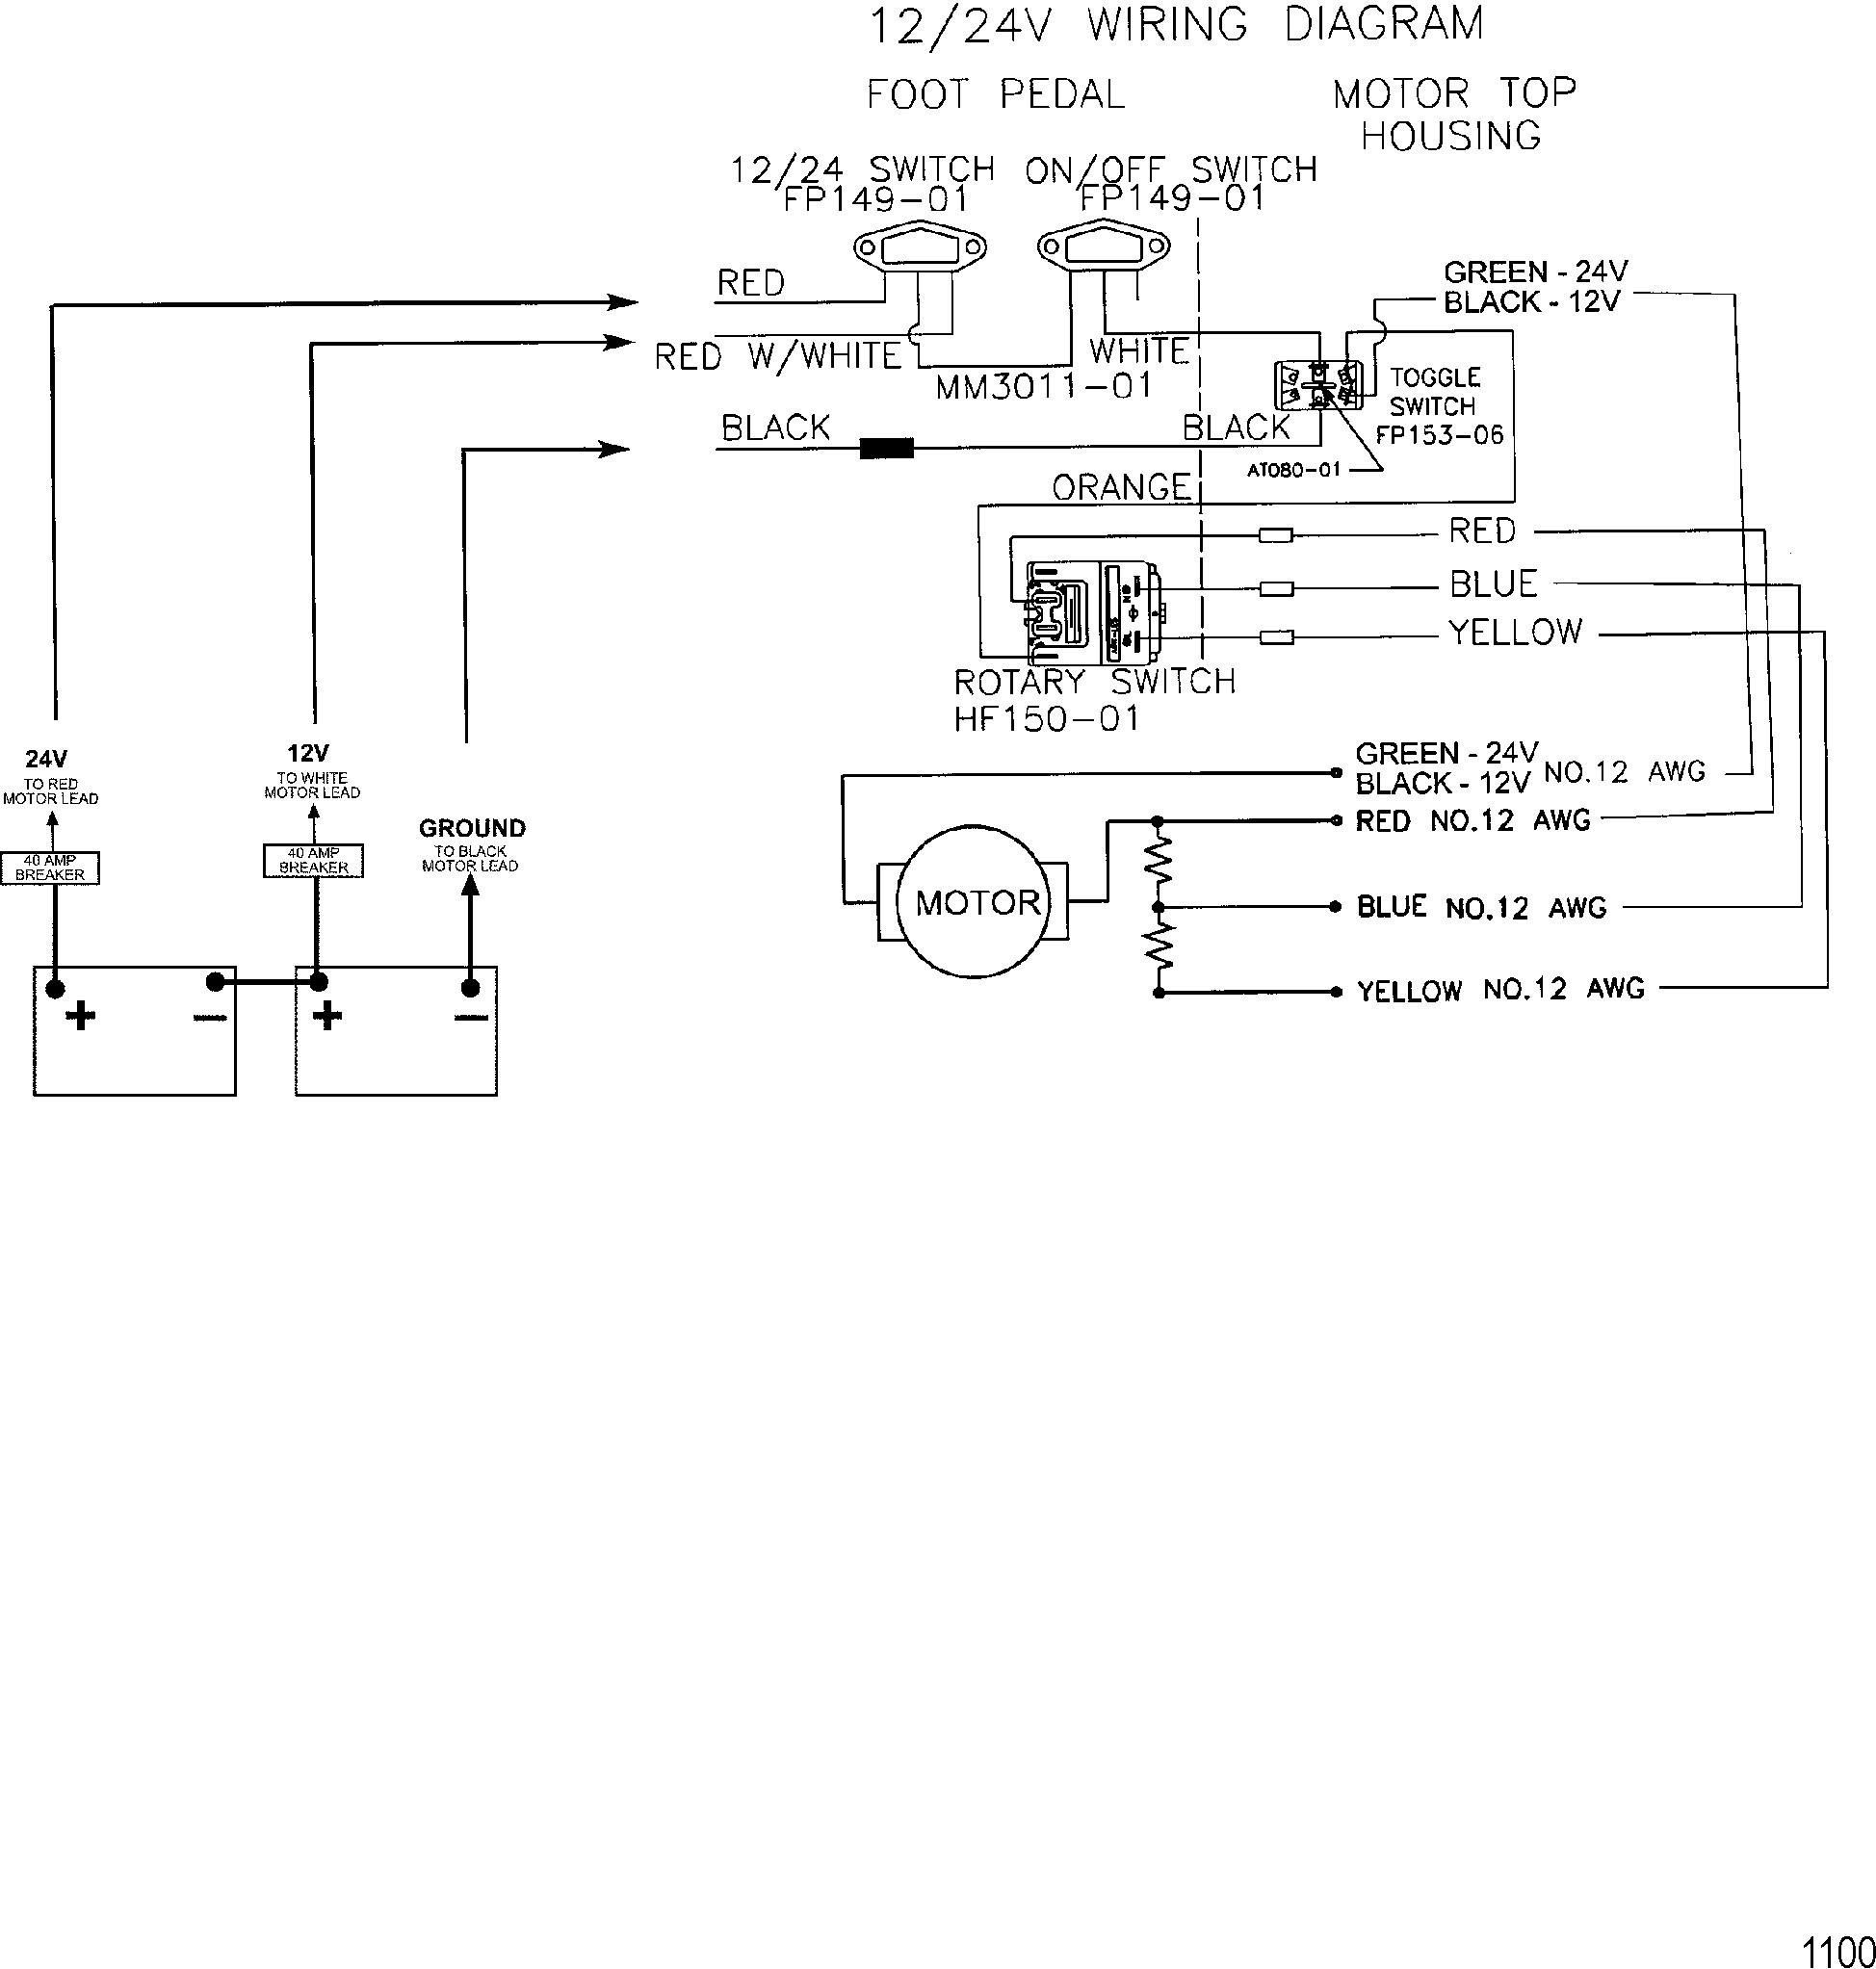 hight resolution of wiring diagram motorguide foot pedal free download wiring diagram db motorguide wiring diagram 12v wiring diagram